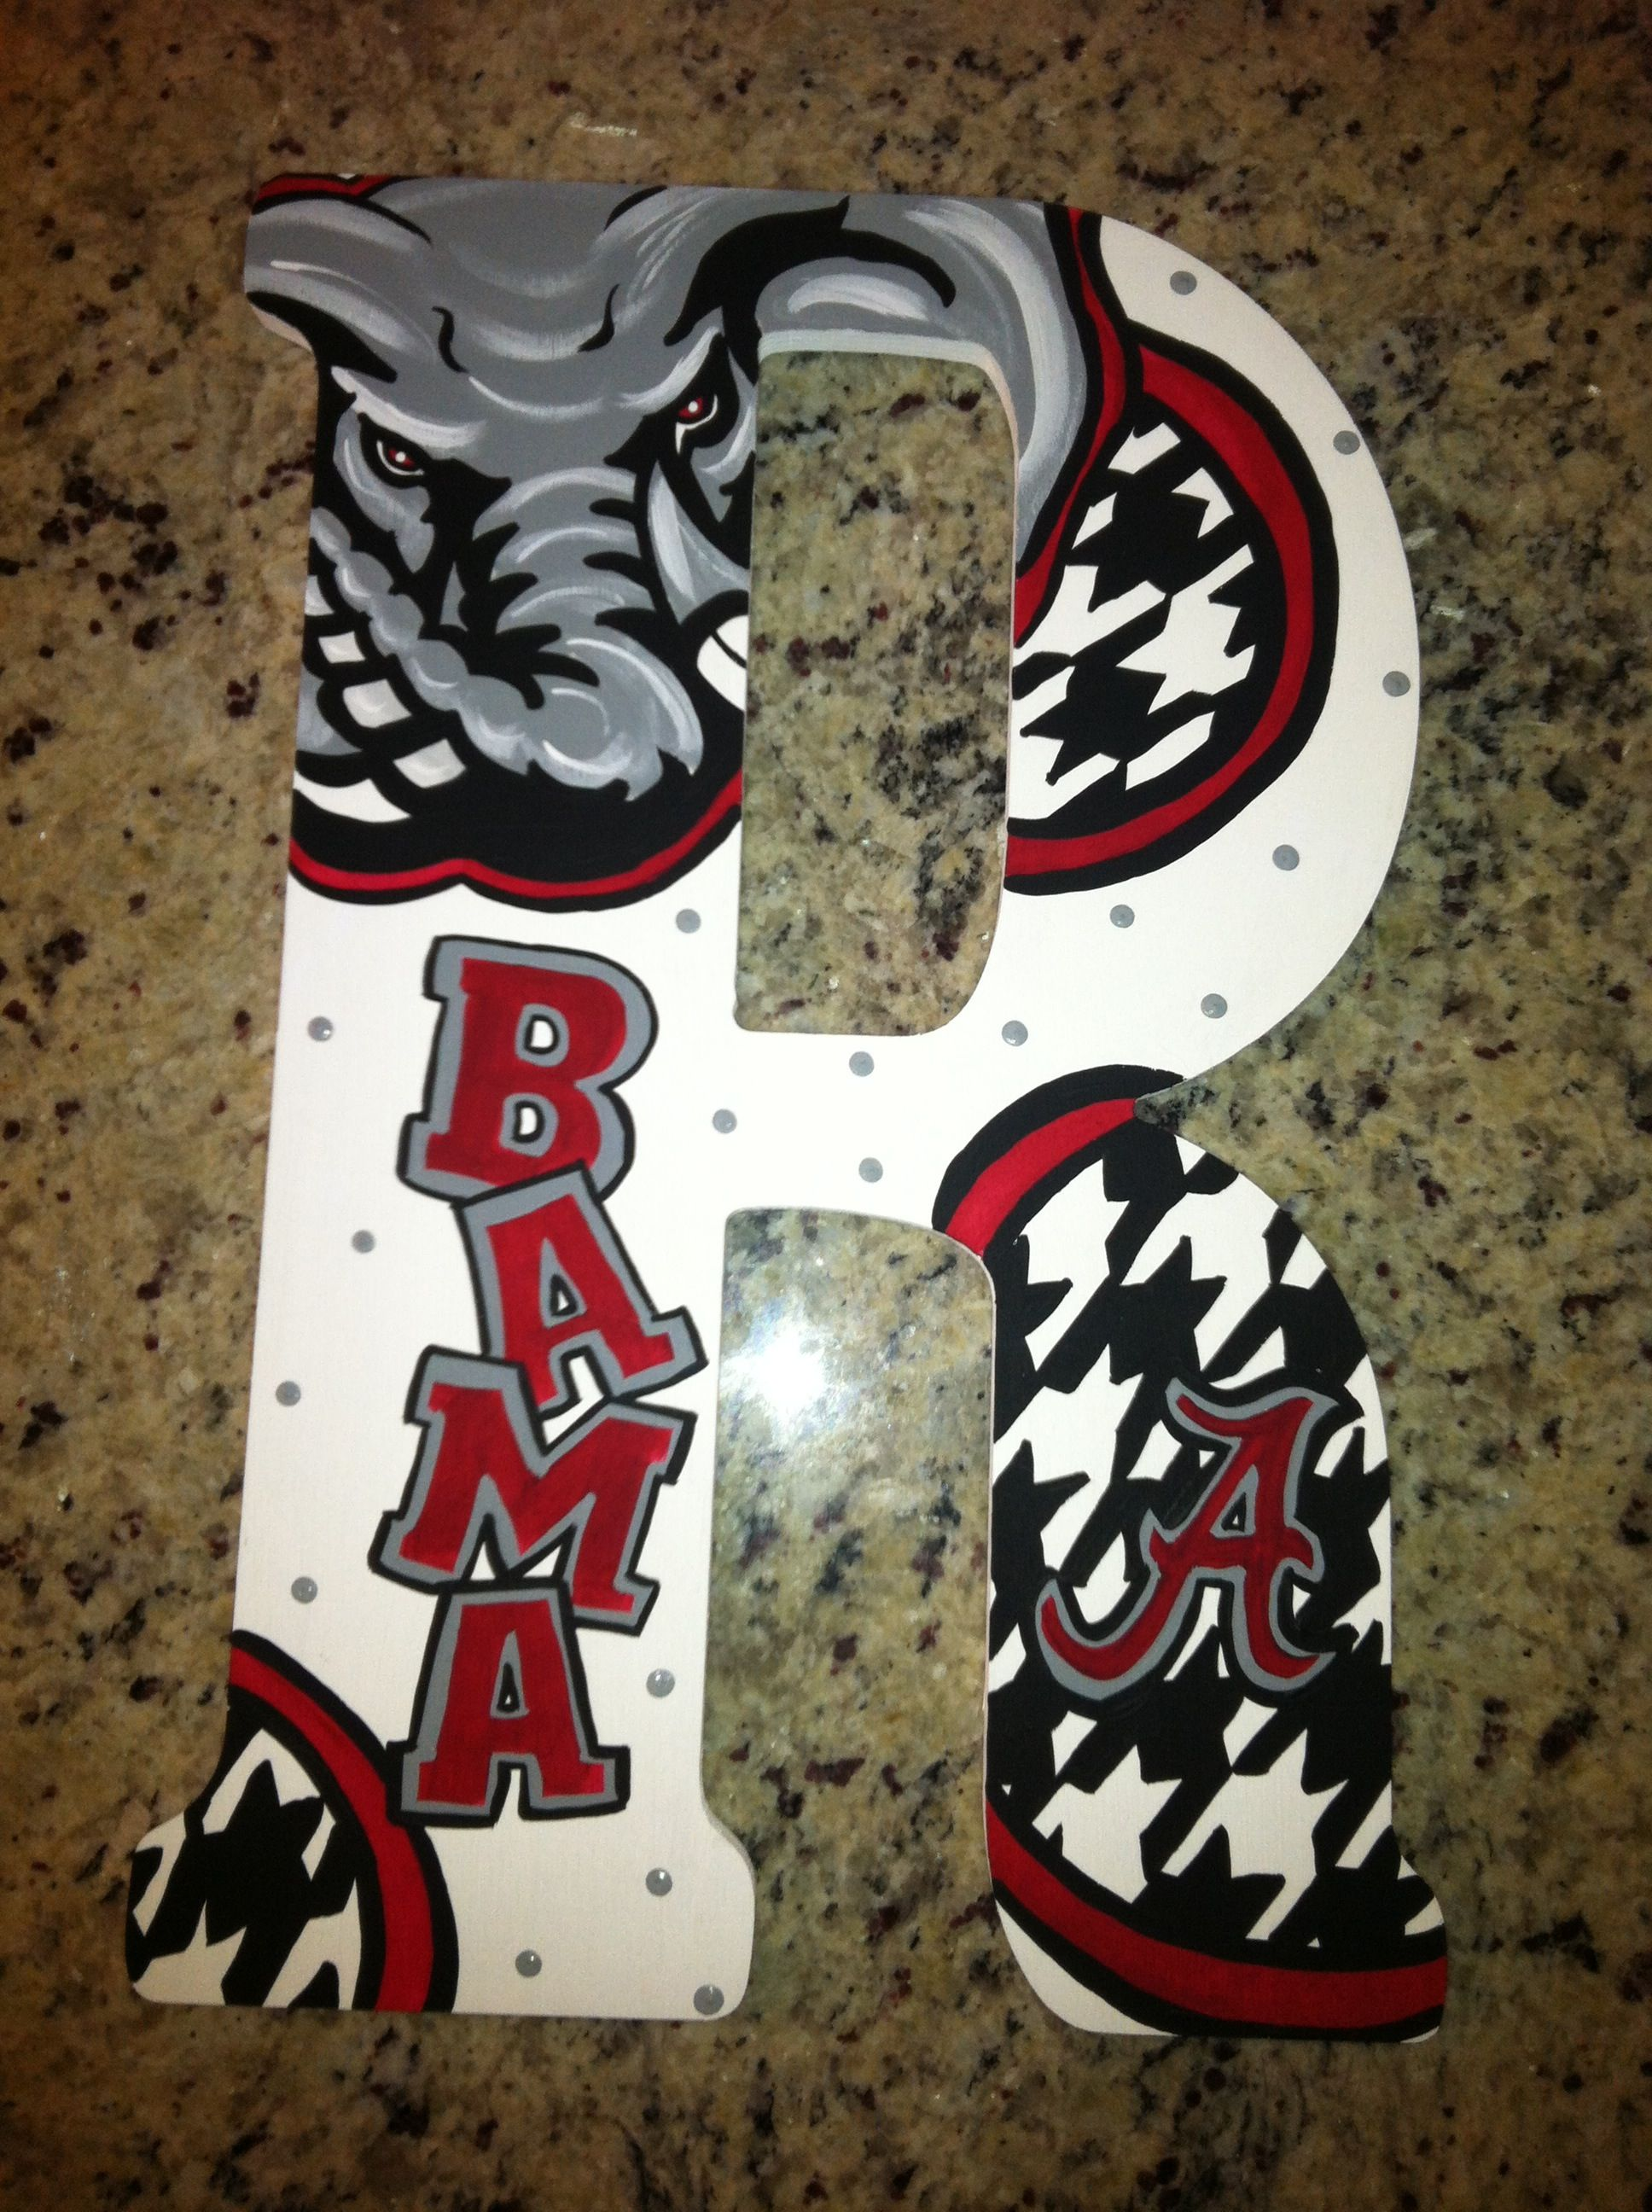 Dam Art And Designs Crimson Tide Alabama Roll Tide Alabama Crimson Tide